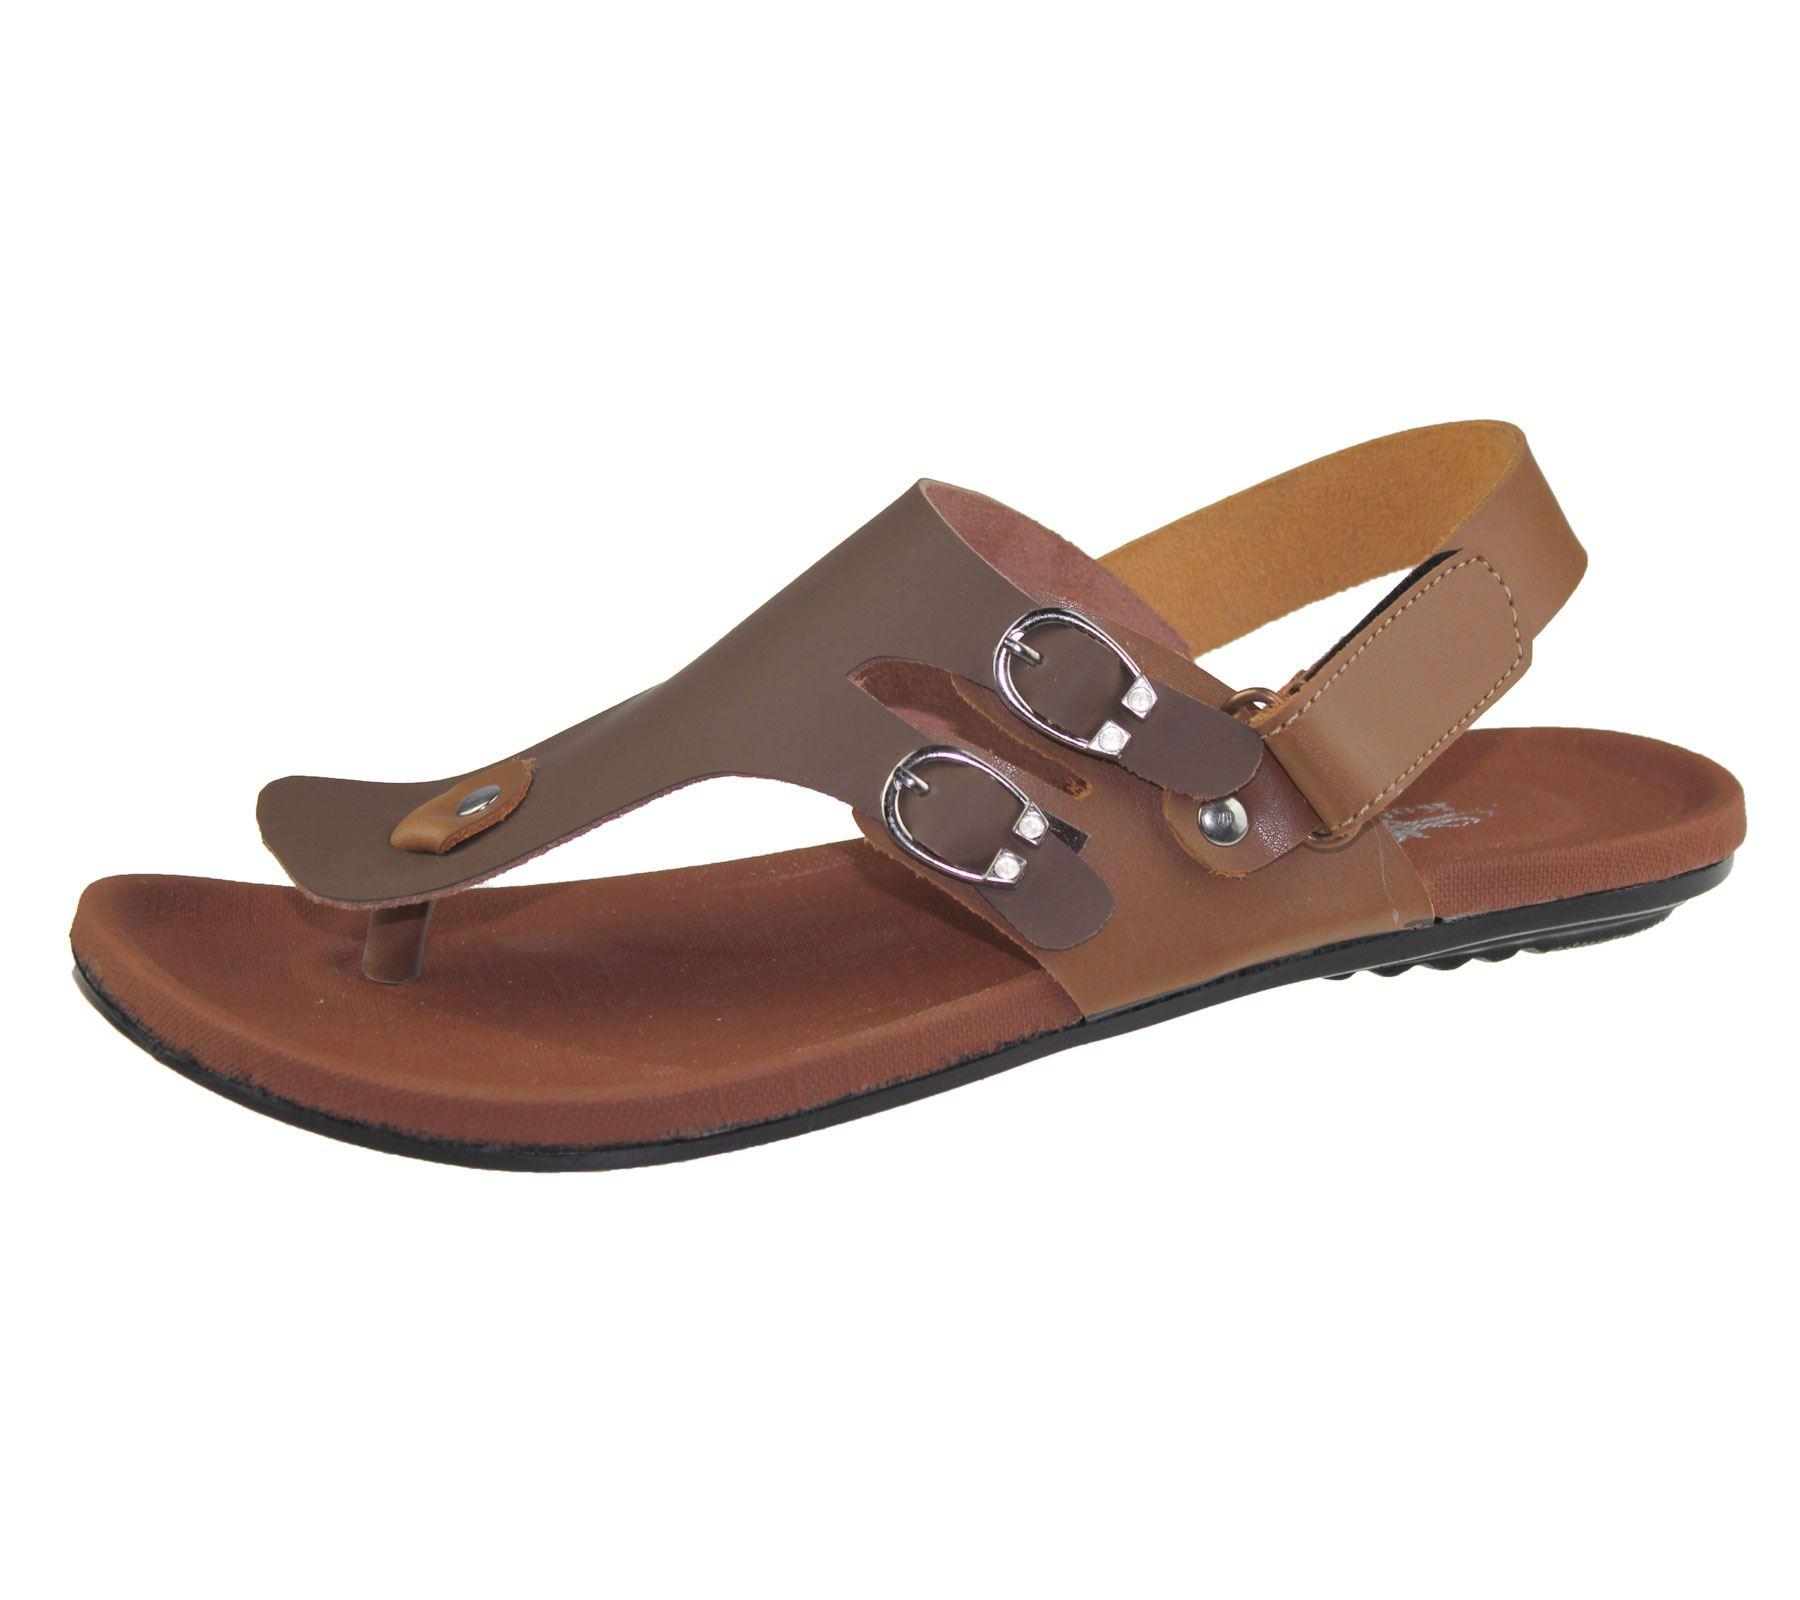 d4522c9f008da Mens Sandals Casual Beach Fashion Boys Walking Slipper Flip Flop Size